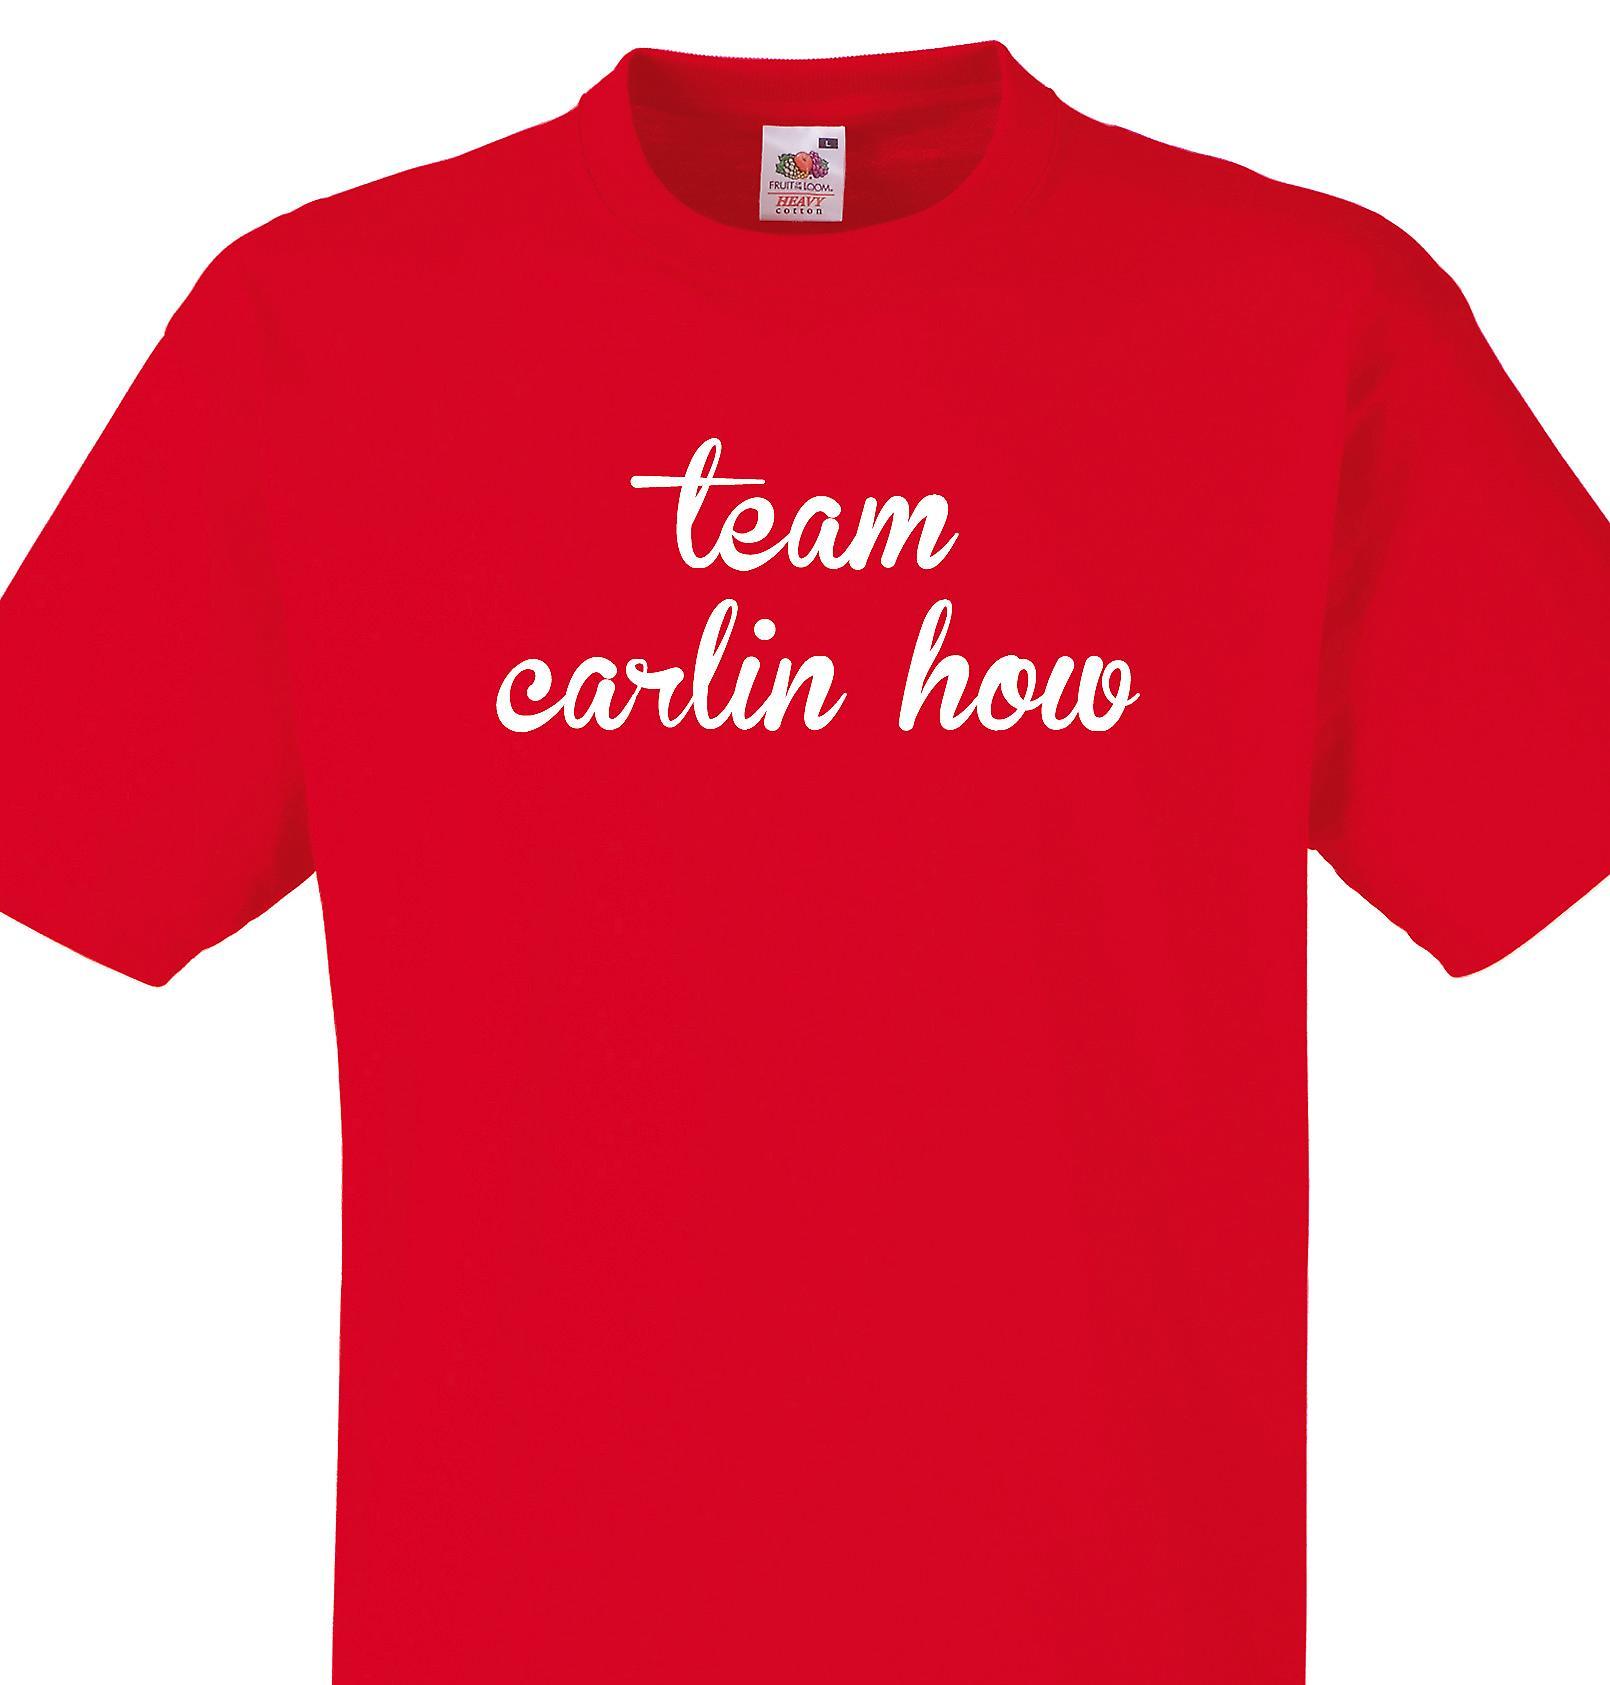 Team Carlin how Red T shirt